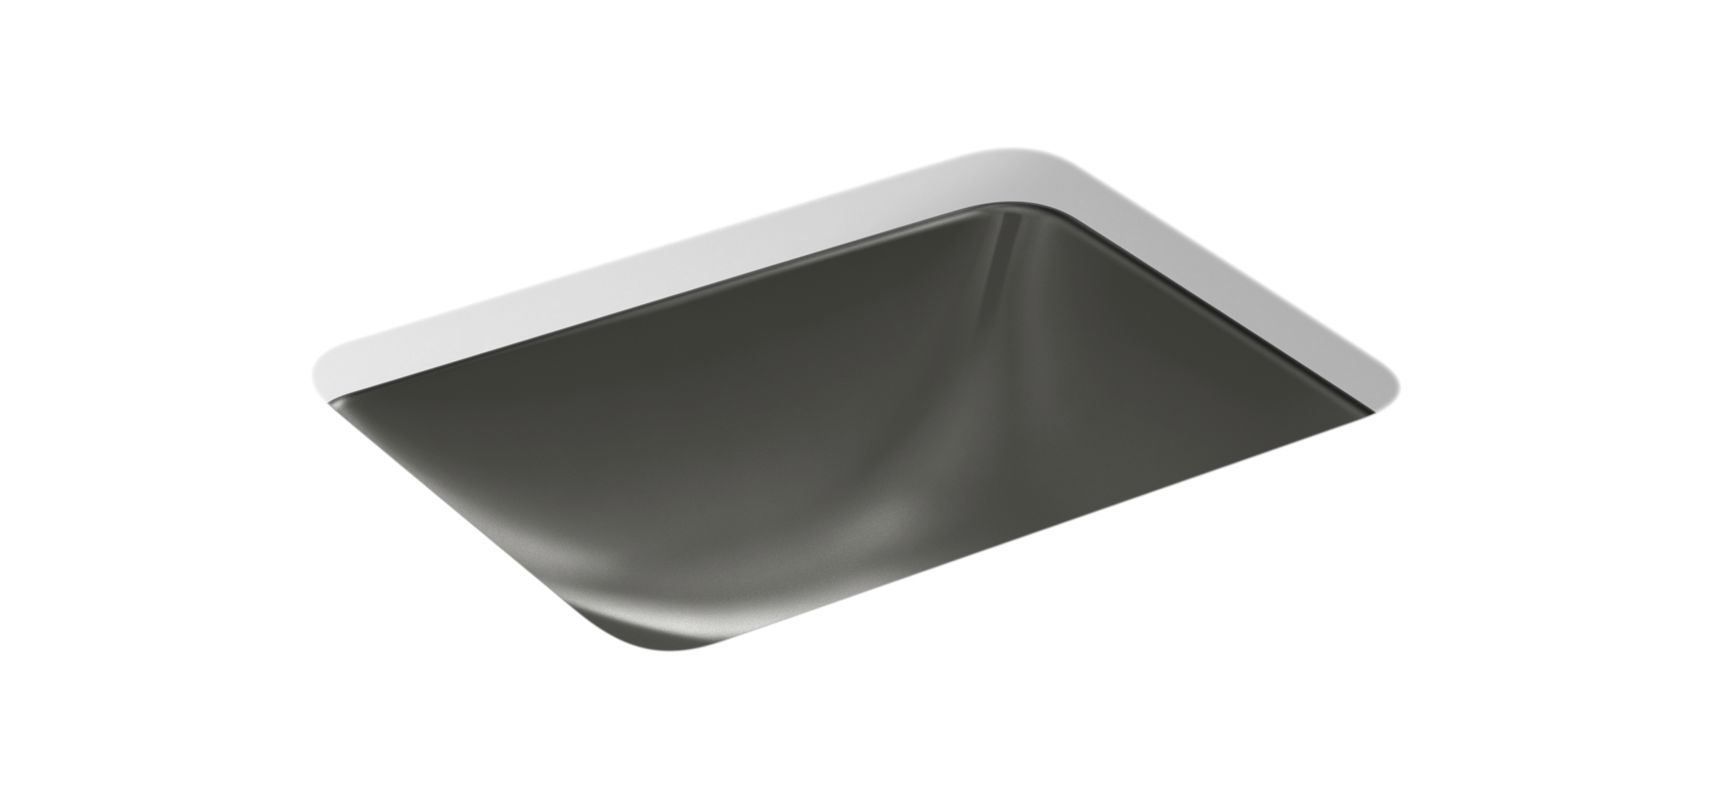 Kohler K 20000 Products Lavatory Sink Kohler Sink Undermount